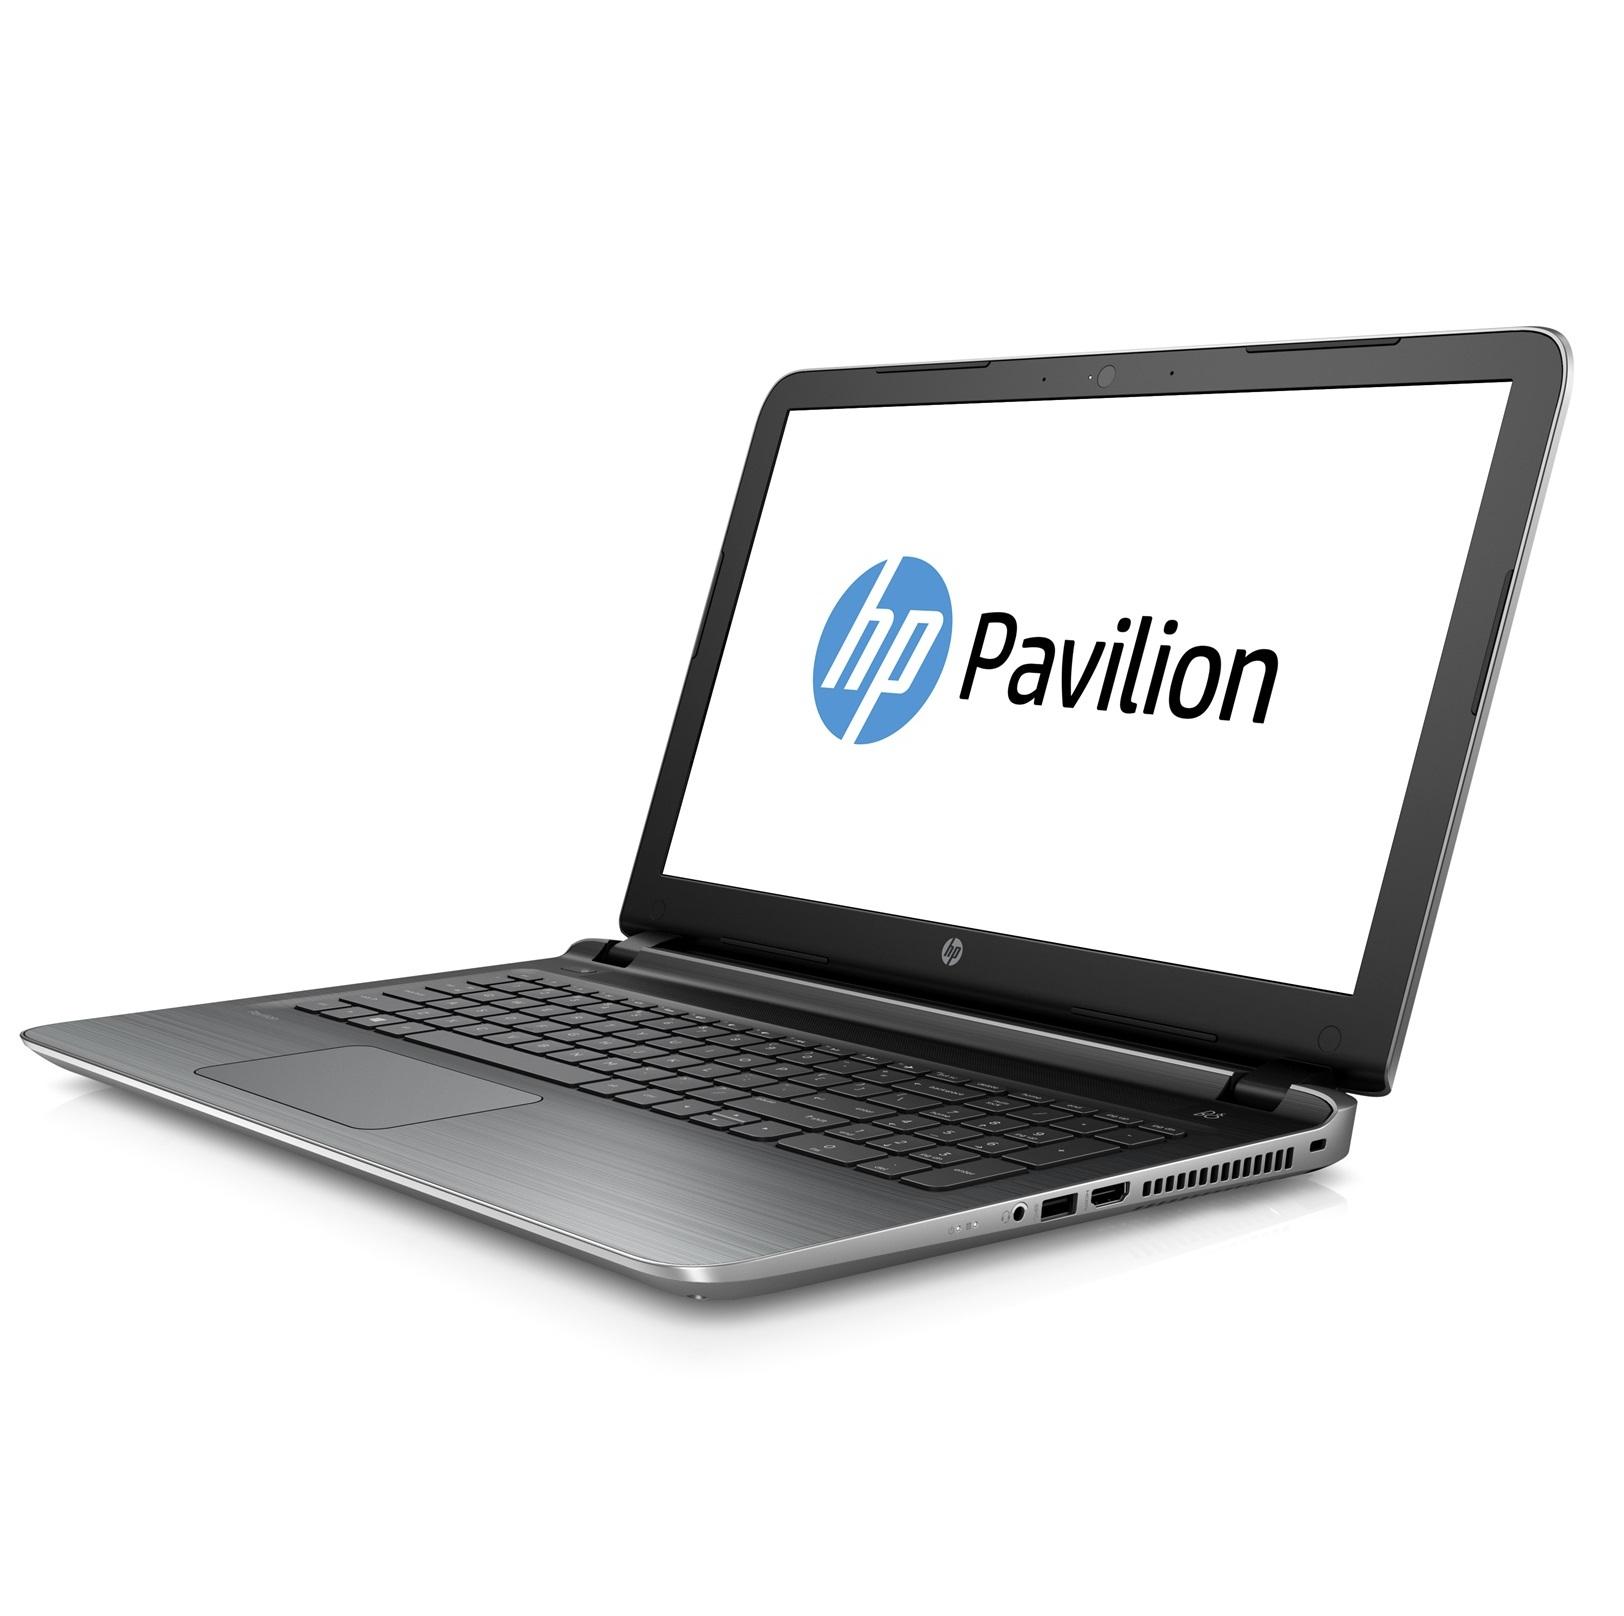 Laptop HP Core i7 Notebook 14-am032TX (X1H07PA) (Silver)